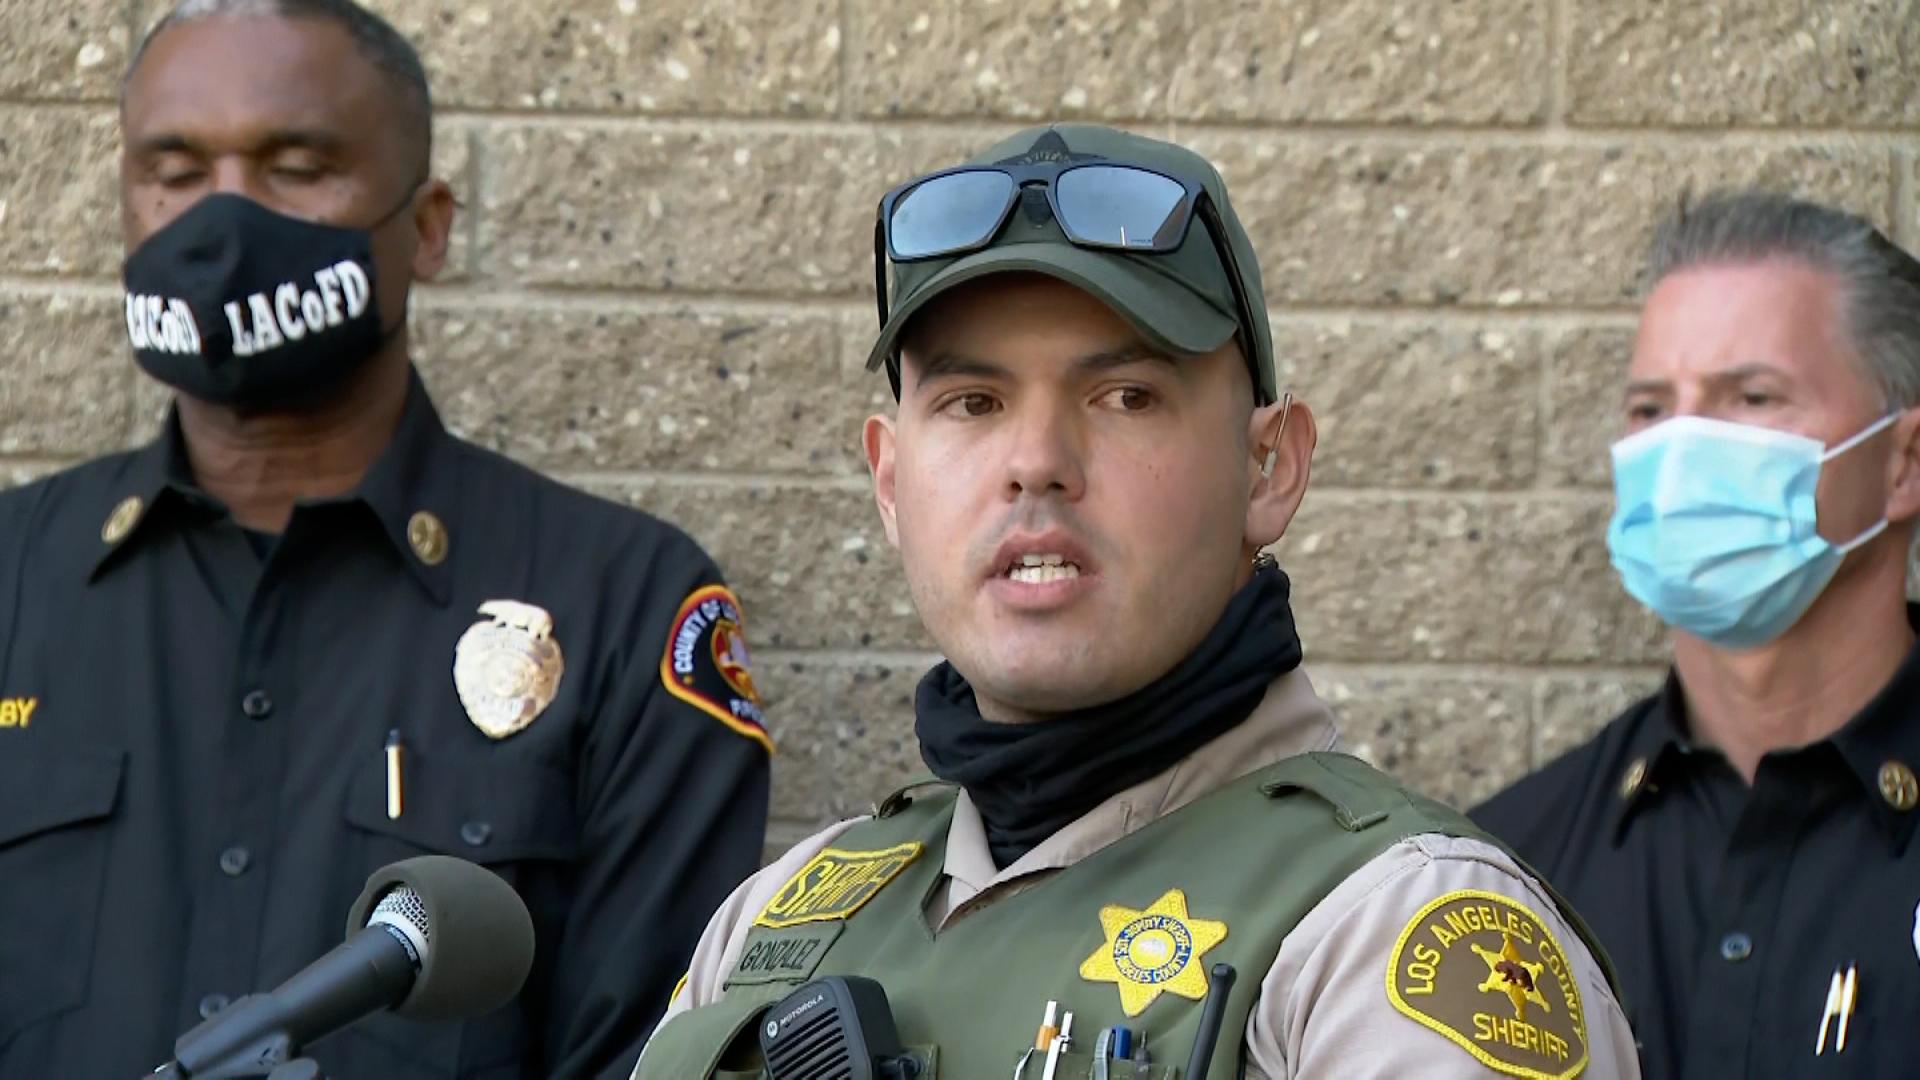 Deputy Carlos Gonzalez.